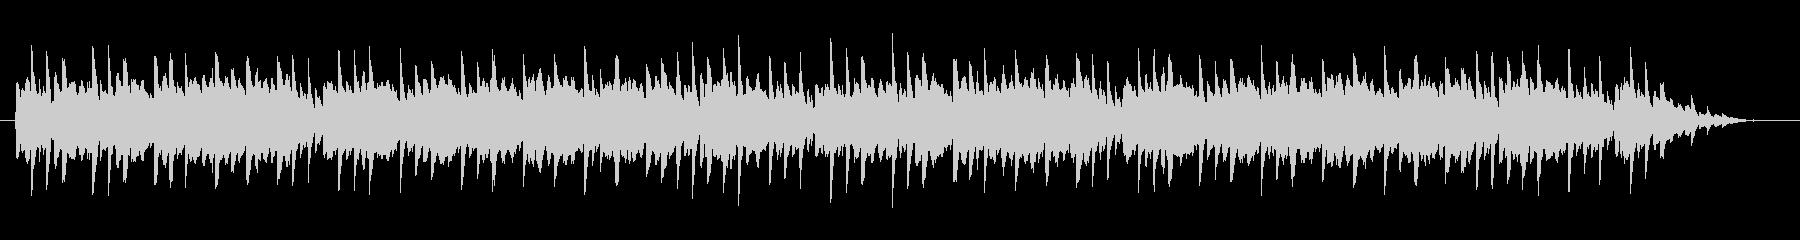 8bitクラシック-Largo-の未再生の波形